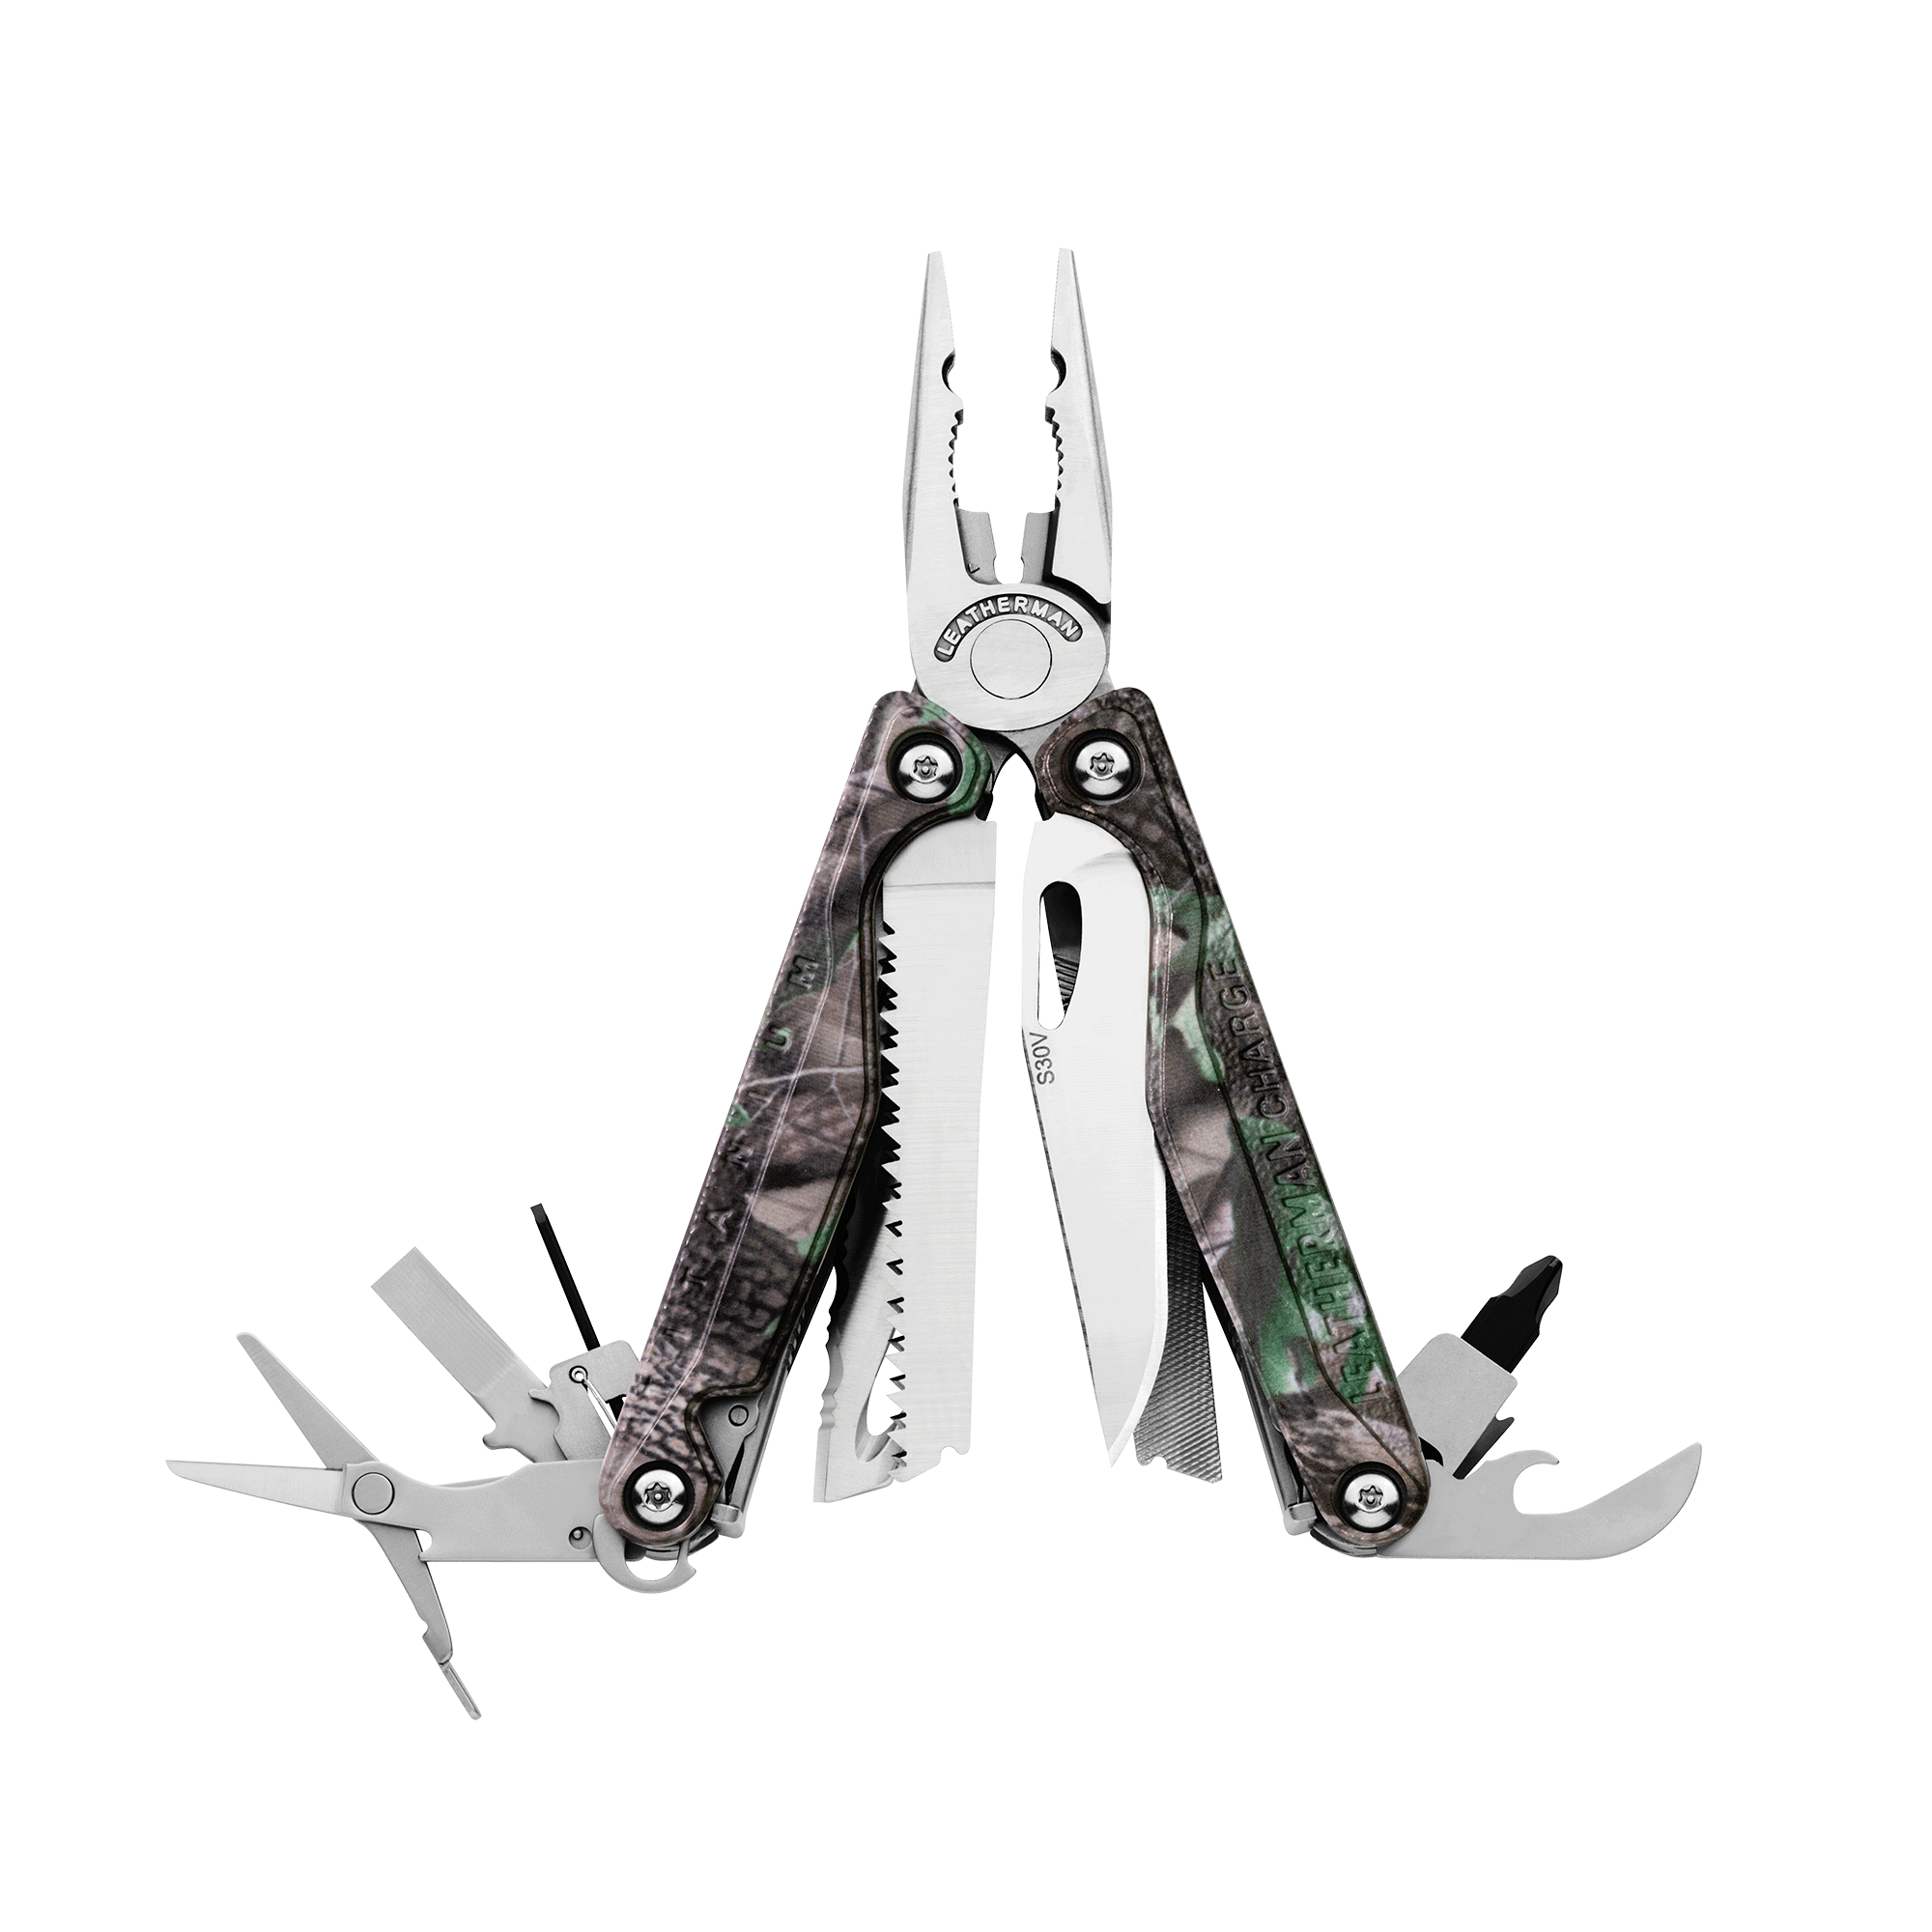 Leatherman Charge TTi multi-tool, open view, Realtree camo print, 18 tools